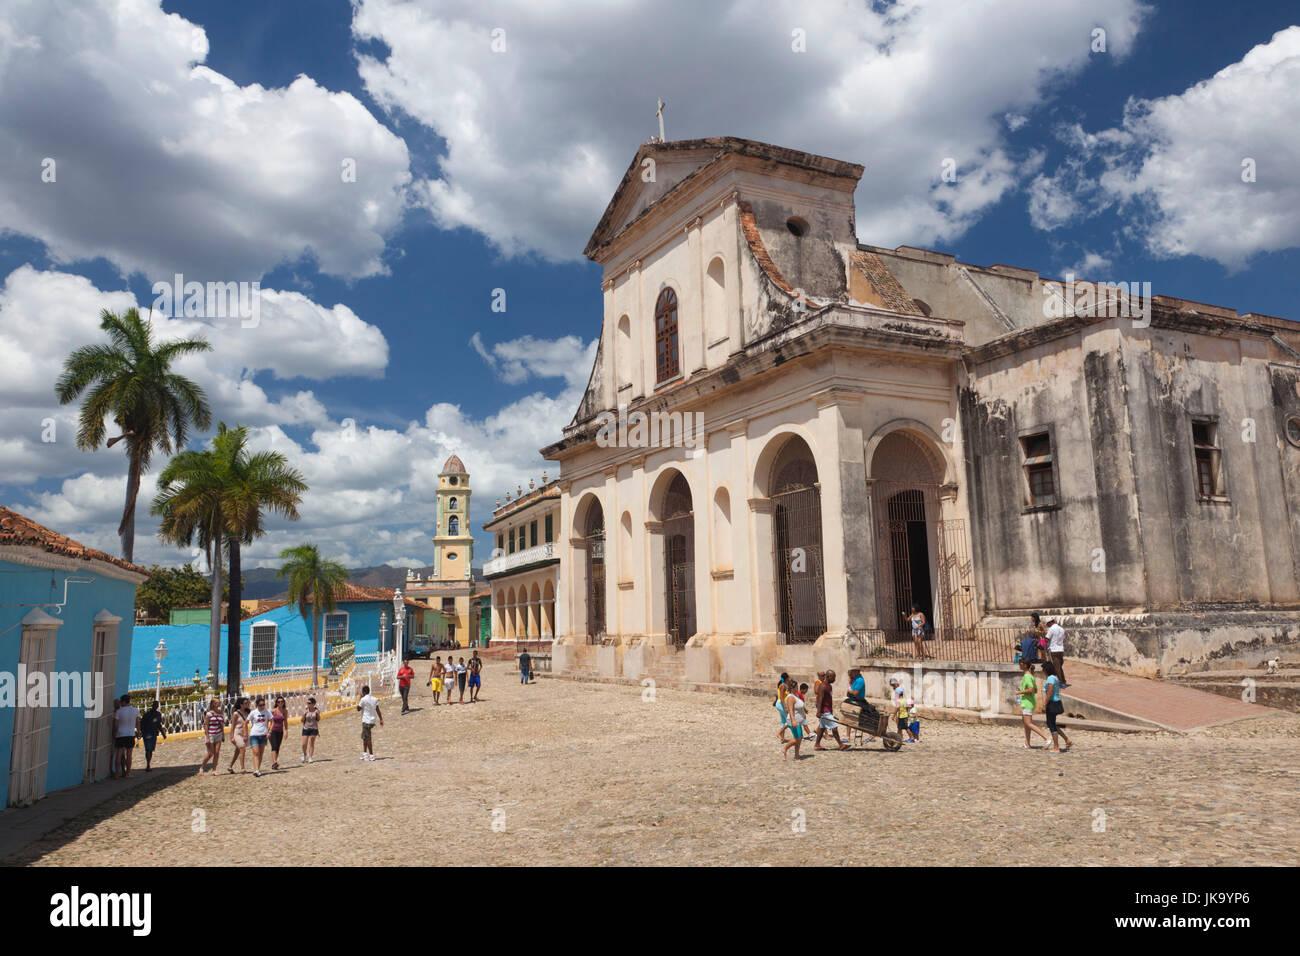 Cuba, Sancti Spiritus Province, Trinidad, Iglesia Parroquial de la Santisima Trinidad, Holy Trinity Church - Stock Image